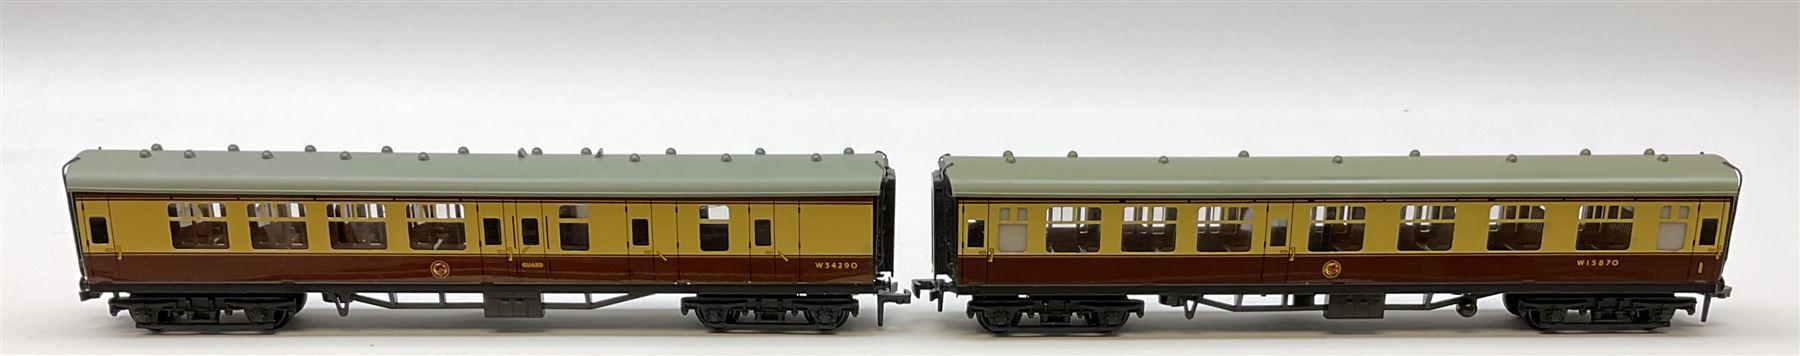 Hornby Dublo - six coaches comprising 4050 Corridor Coach 1st/2nd W.R.; 4051 Corridor Coach Brake/2n - Image 2 of 5